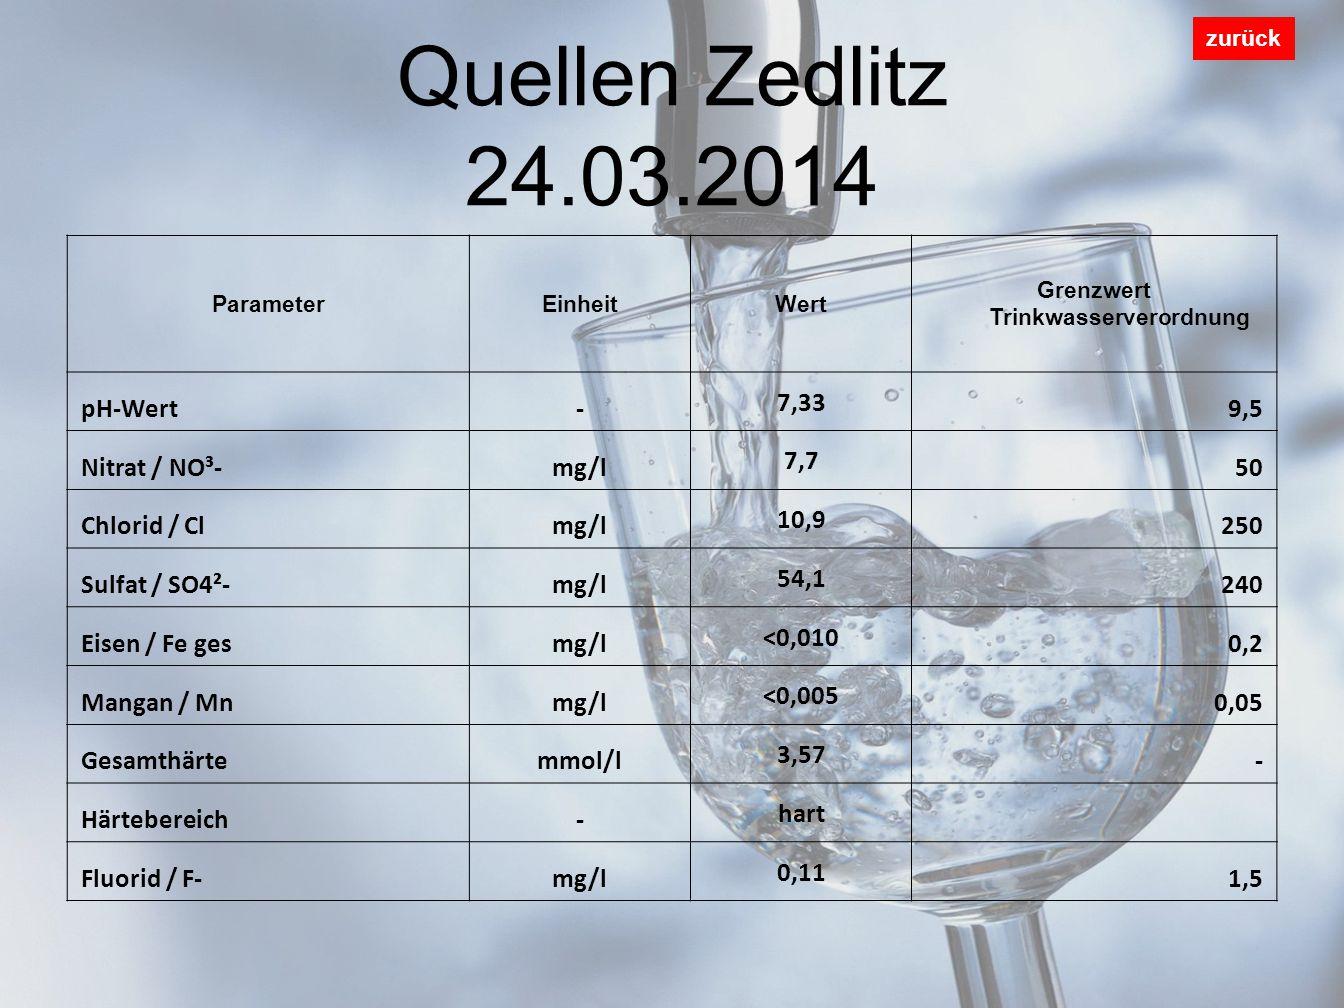 Quellen Zedlitz 24.03.2014 zurück ParameterEinheitWert Grenzwert Trinkwasserverordnung pH-Wert- 7,33 9,5 Nitrat / NO³-mg/l 7,7 50 Chlorid / Clmg/l 10,